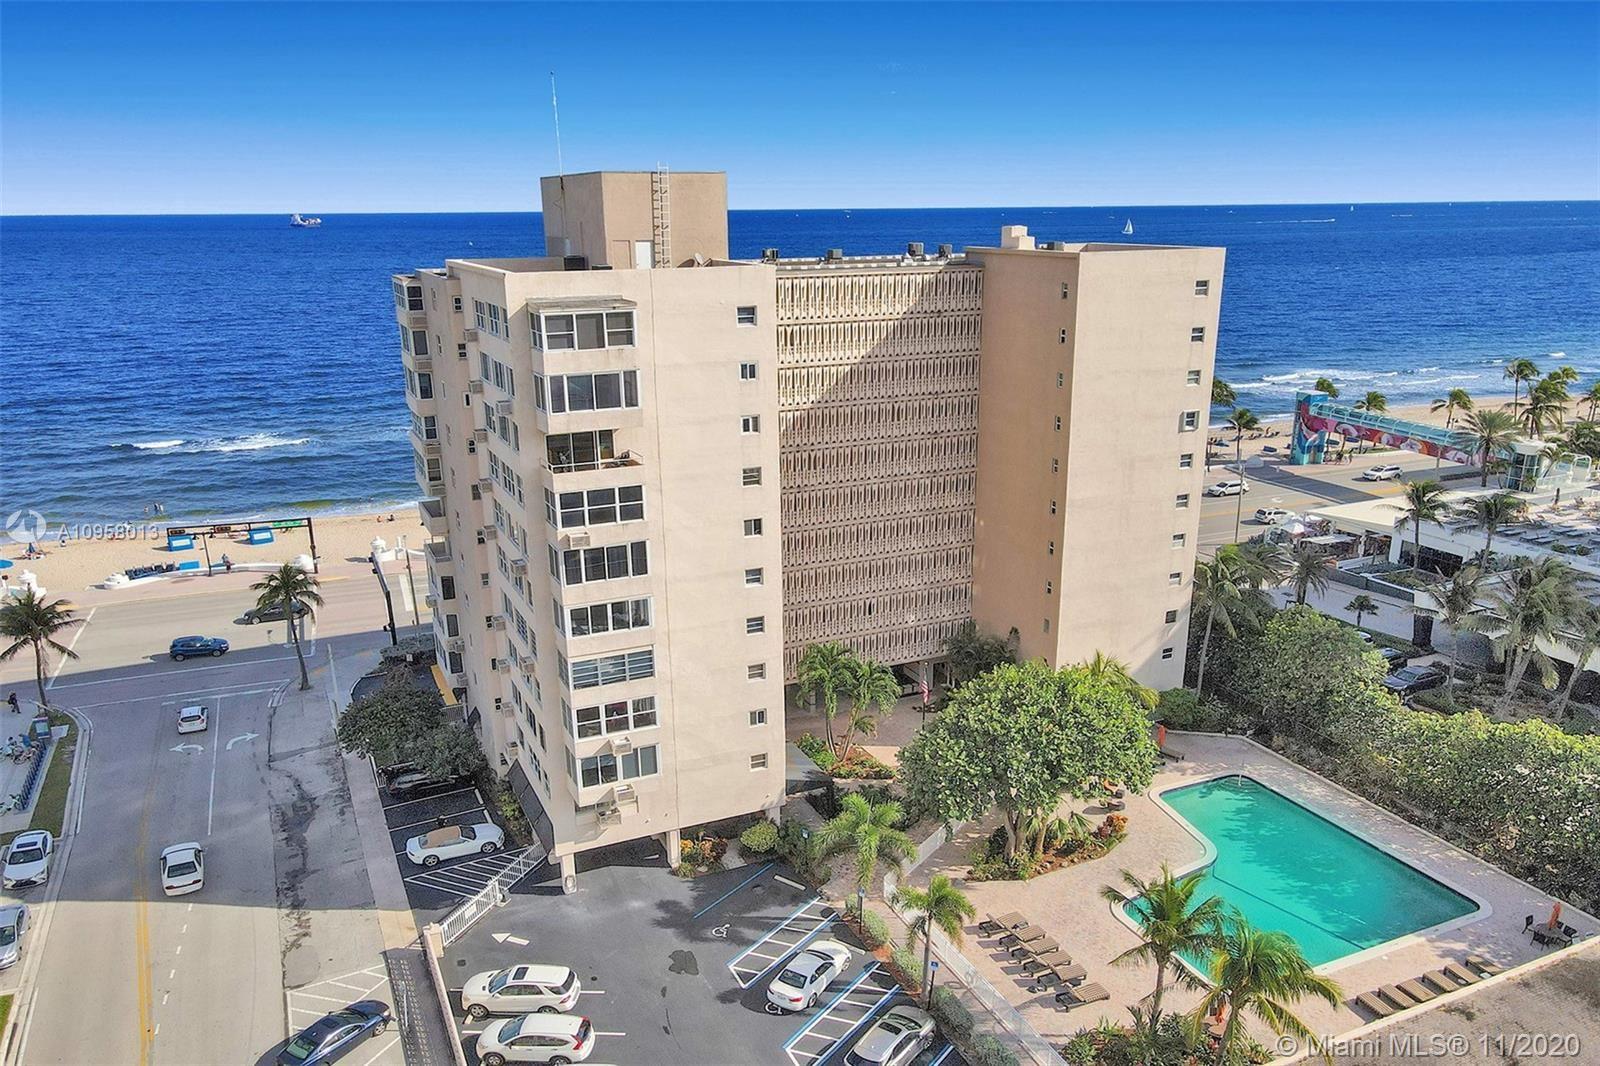 Photo of 345 N Fort Lauderdale Beach Blvd #1001, Fort Lauderdale, FL 33304 (MLS # A10958013)